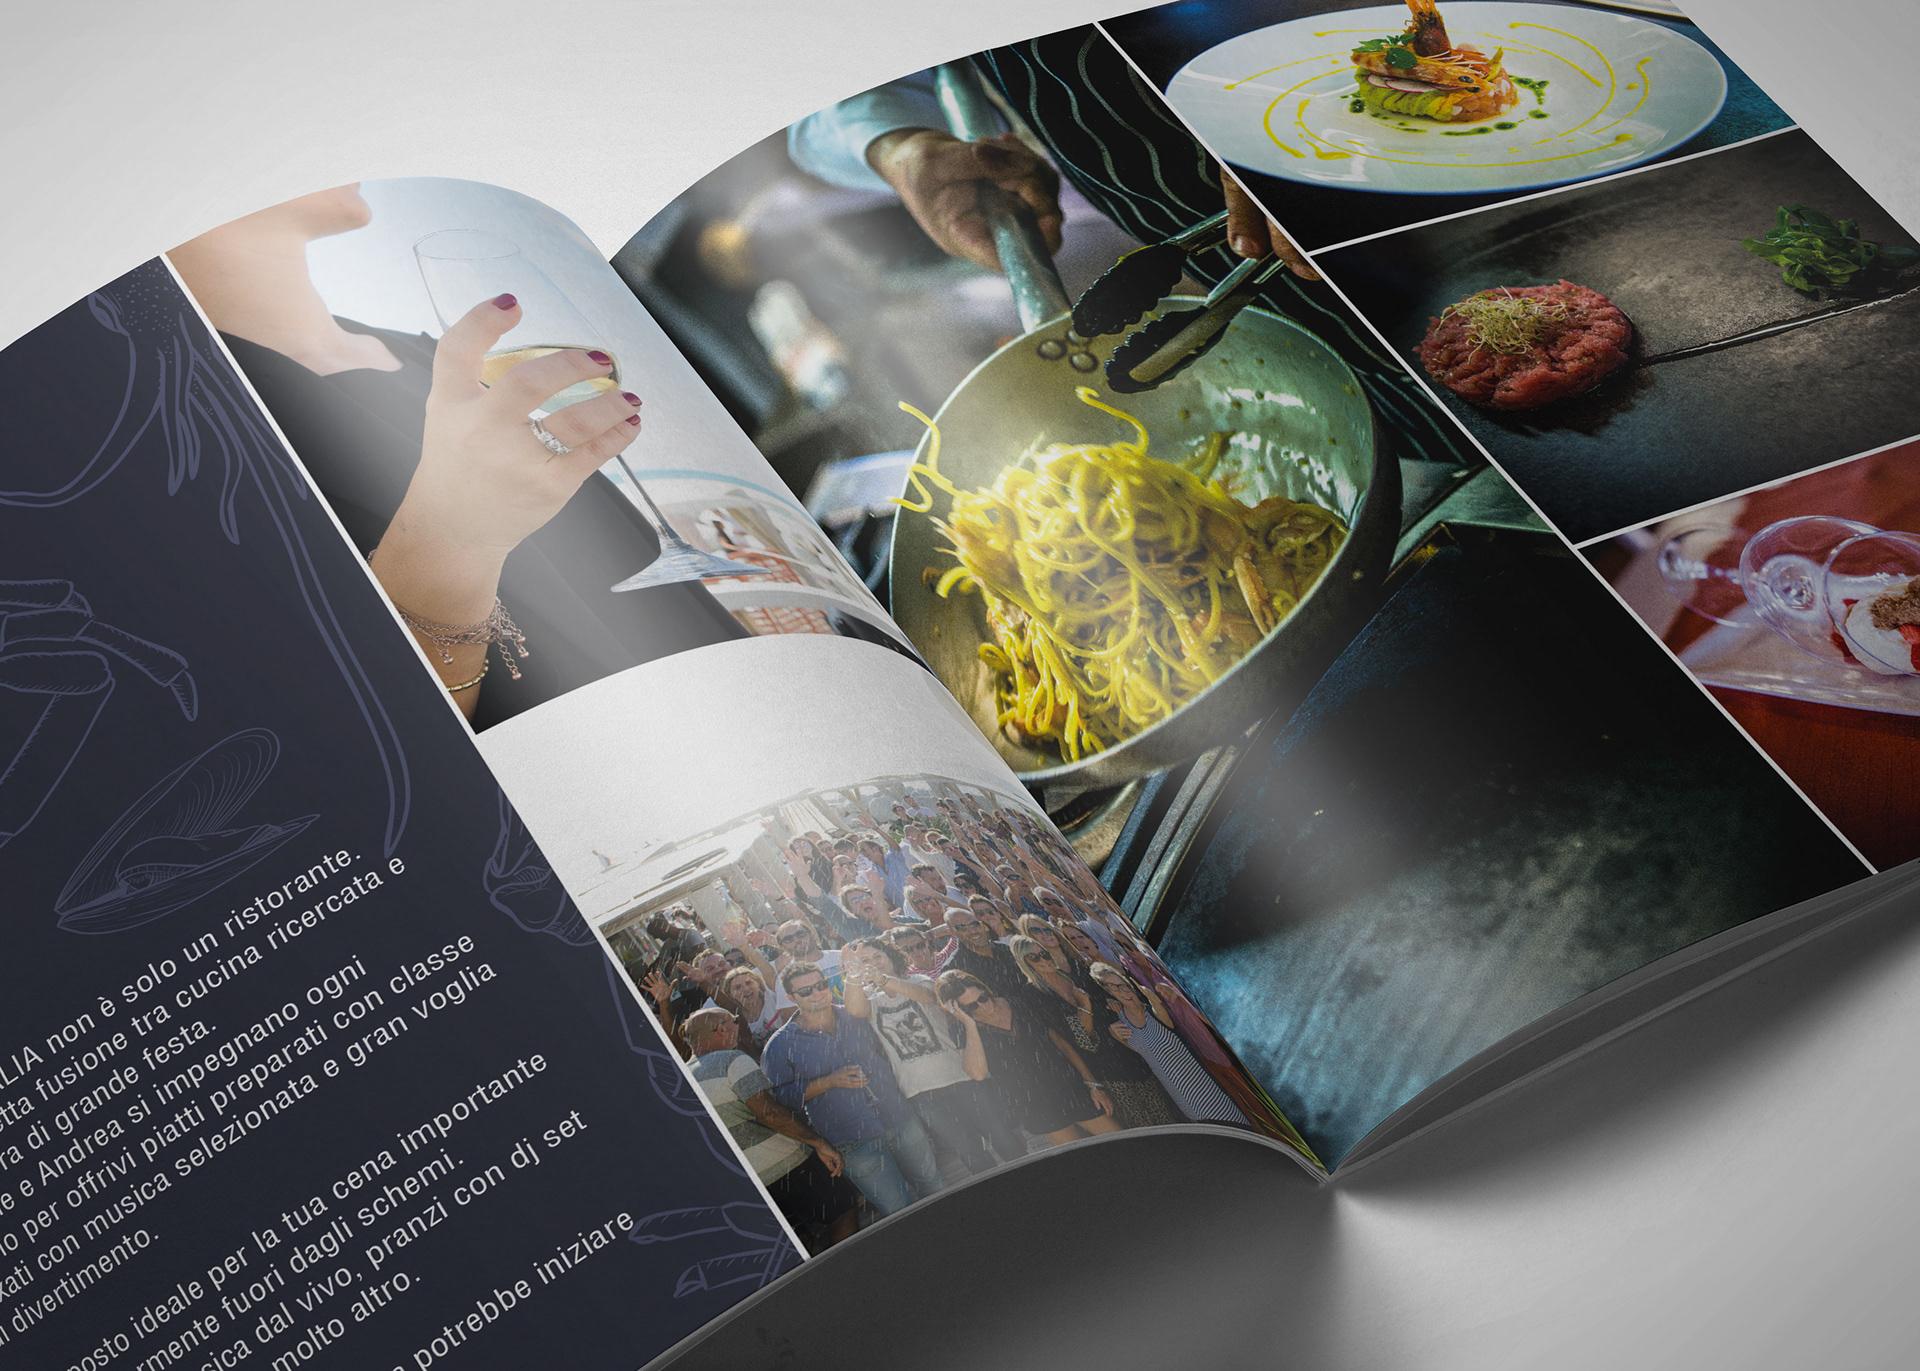 Ristorante Bagno Italia Marina Di Pisa : Luca masini bagno italia restaurant brochure